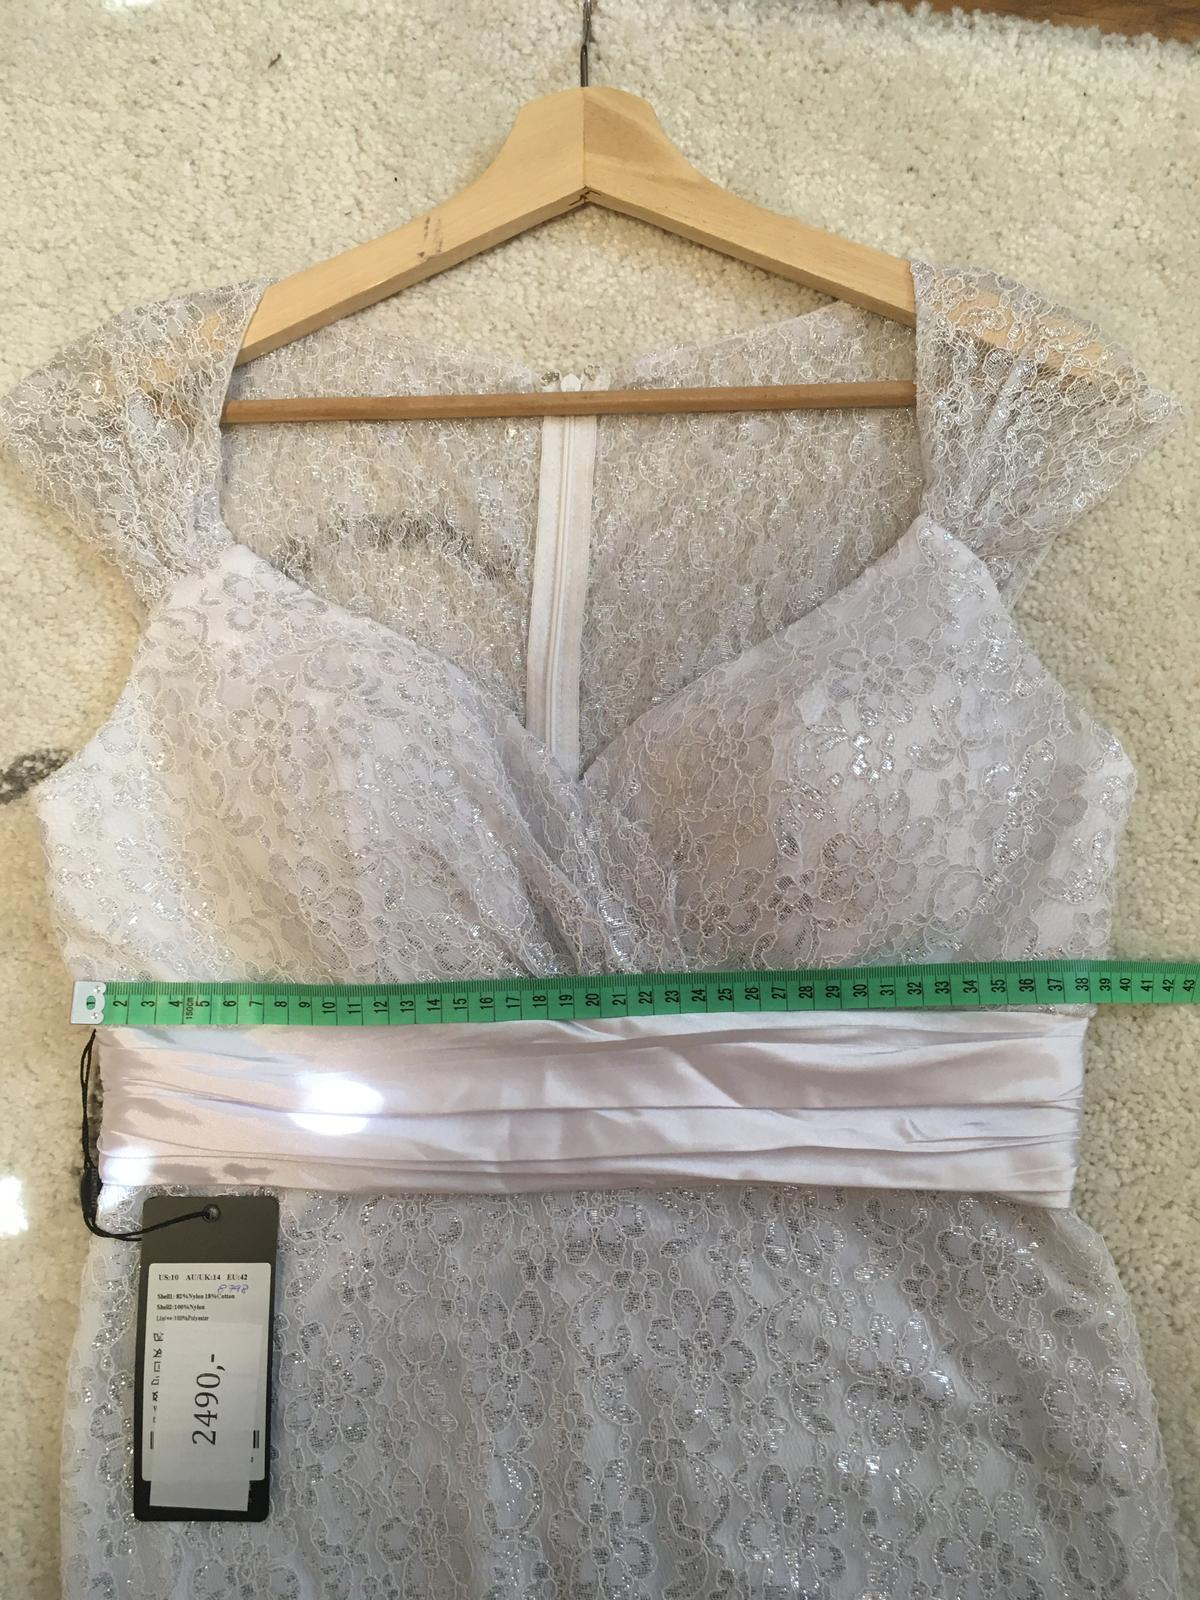 Krajkové šaty ePretty - Obrázek č. 2